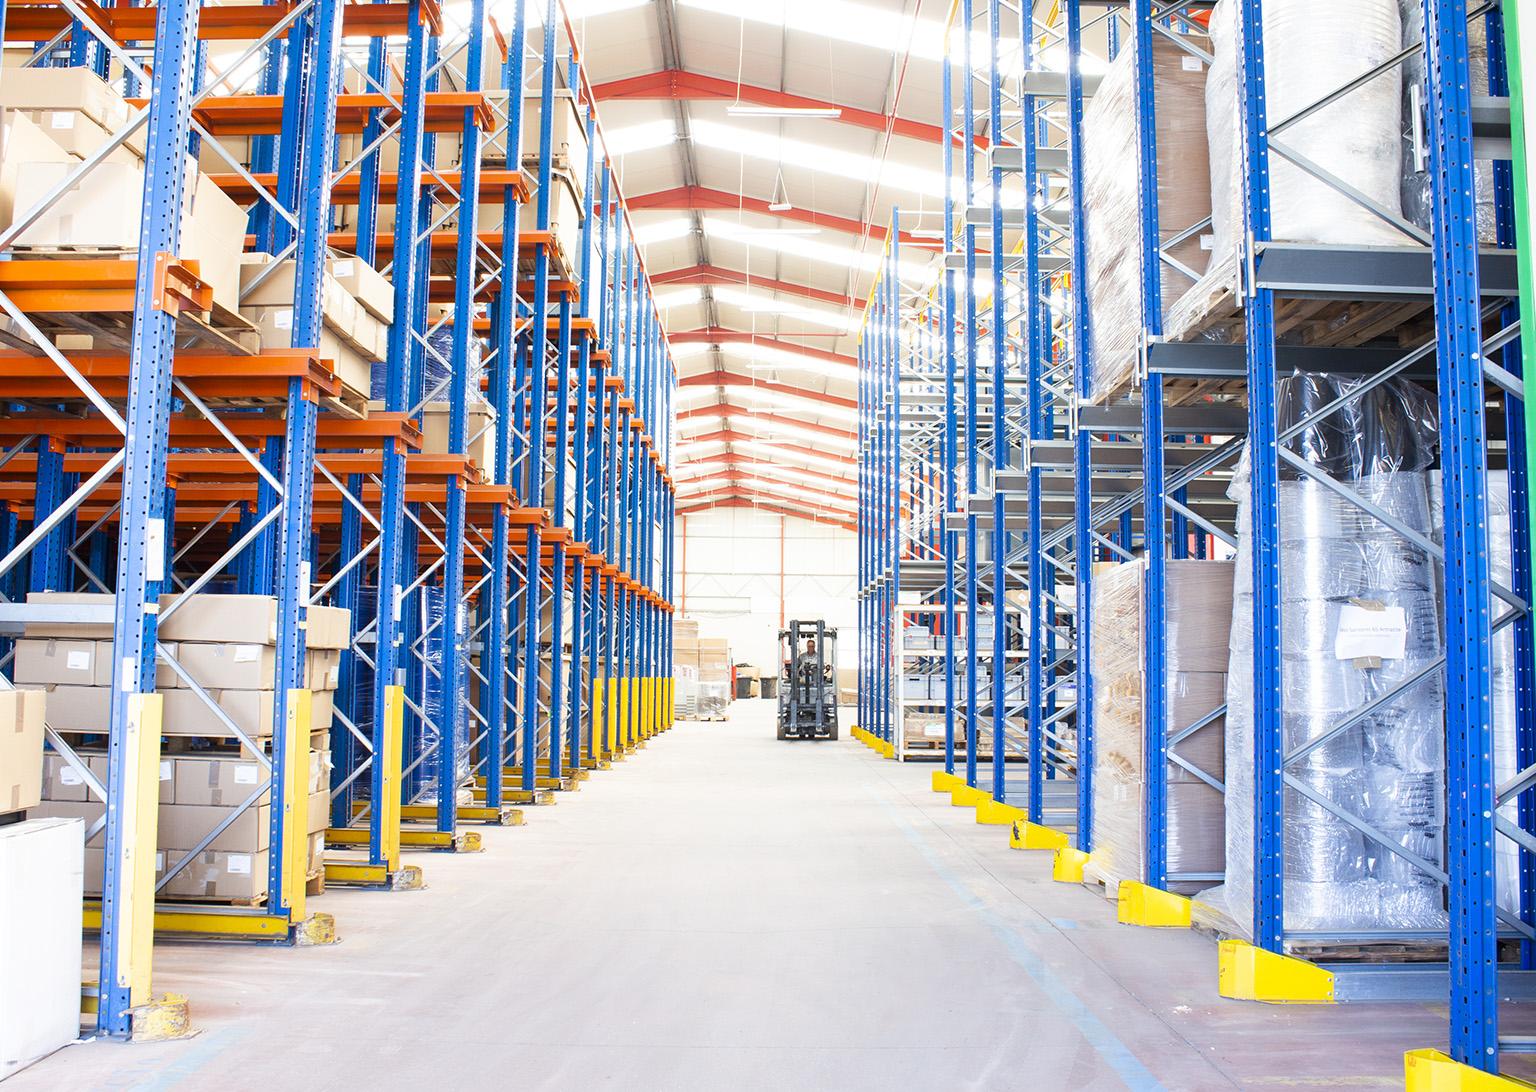 Plastics warehouse depth view at MOLDIT Industries